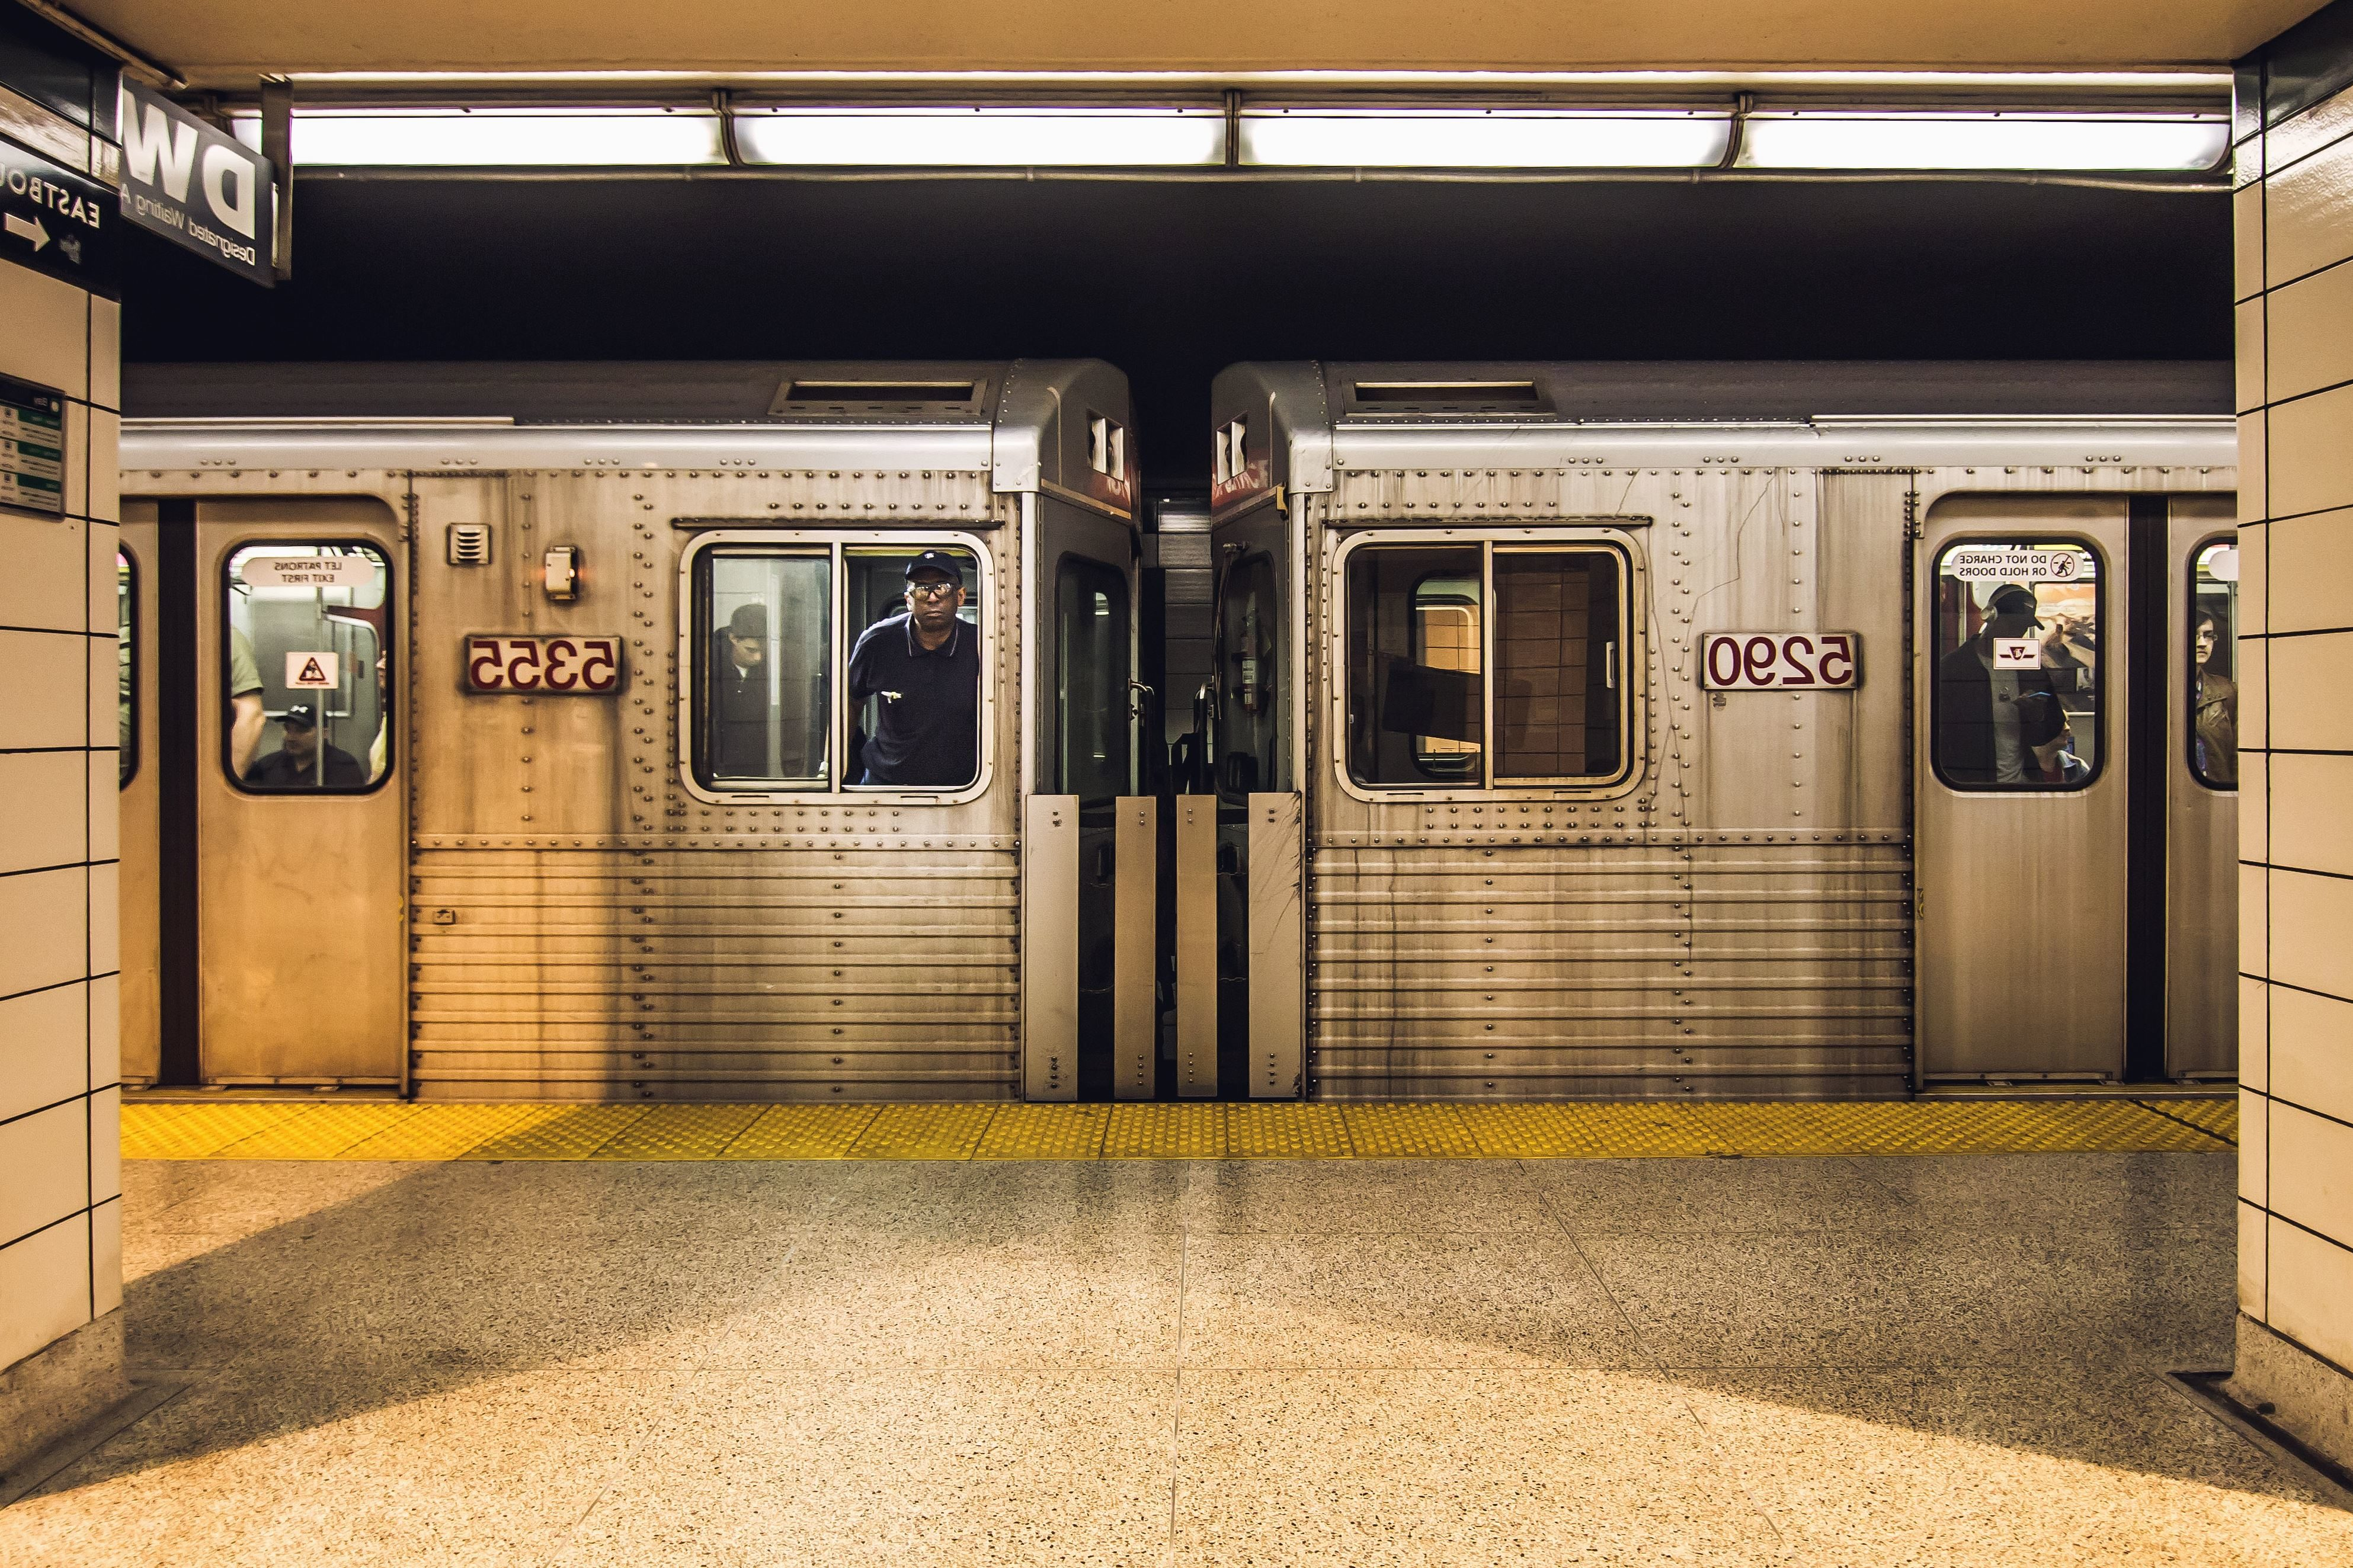 Foto gratis: treno vagone luce metropolitana piastrelle da parete